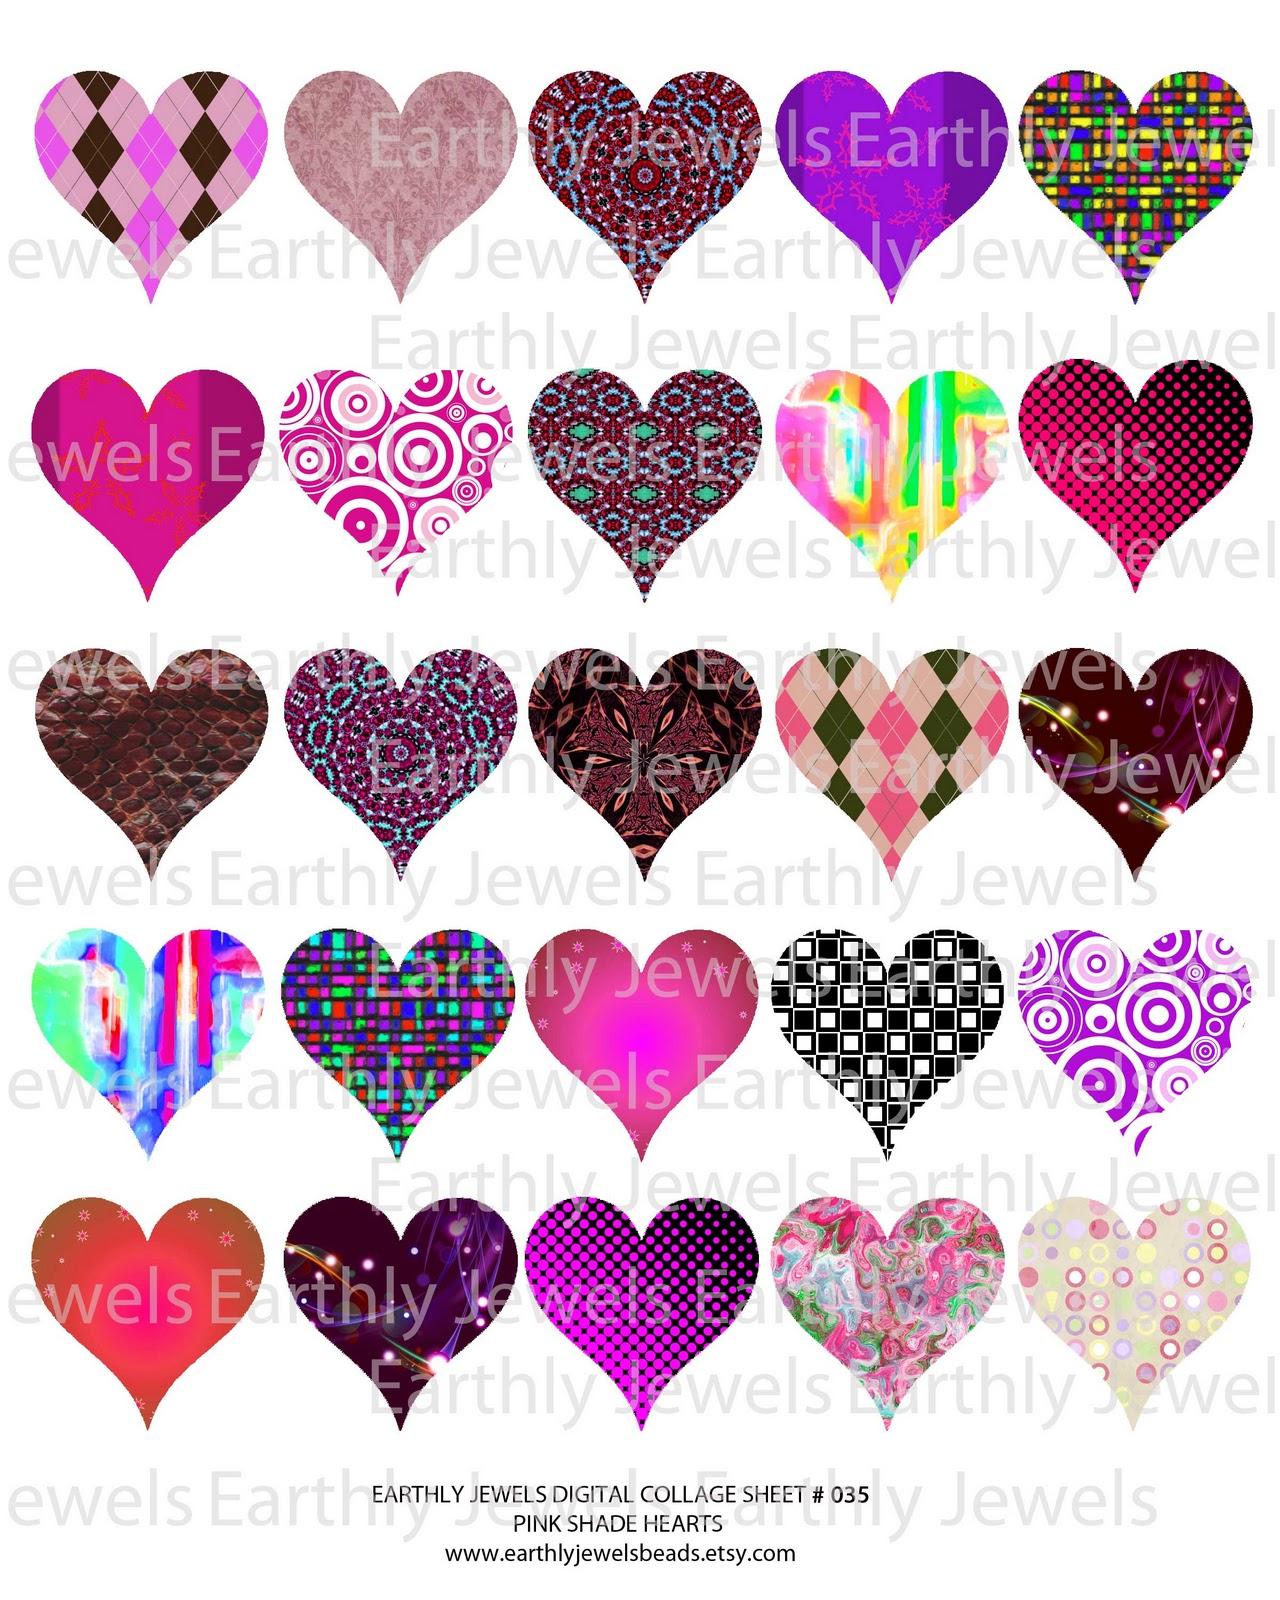 http://1.bp.blogspot.com/-K3pAYDCuYFs/TxPoKJpp2ZI/AAAAAAAABl8/MFW3nCugGpo/s1600/SHEET035_8X10_15X15_HEART_PINKSHADEHEART.jpg